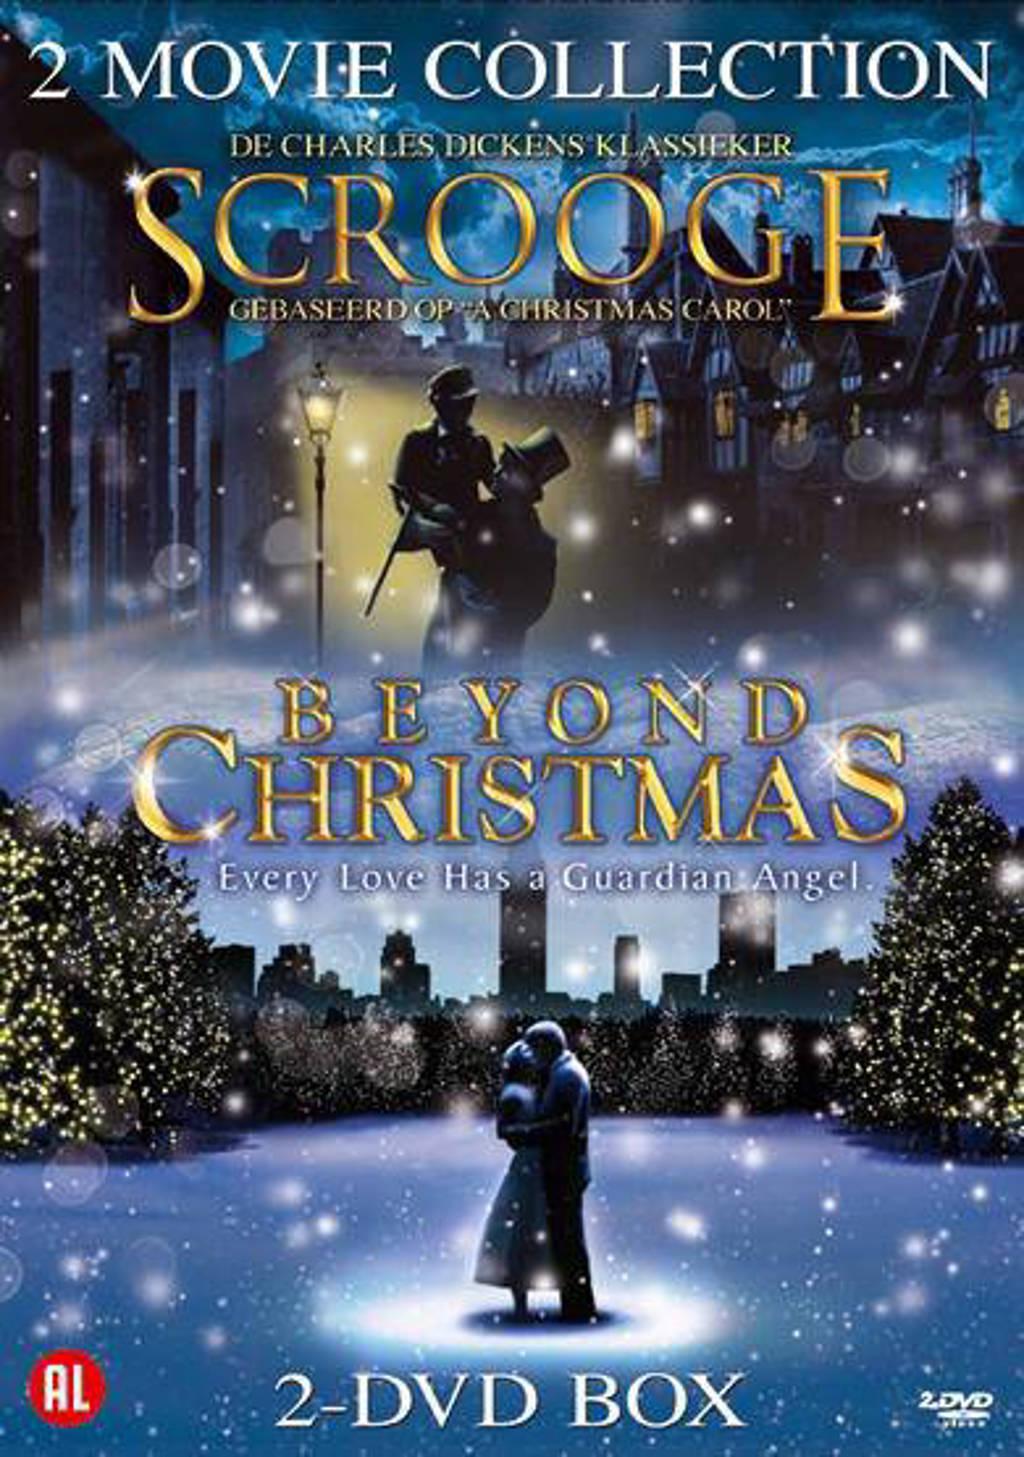 Scrooge/Beyond christmas (DVD)